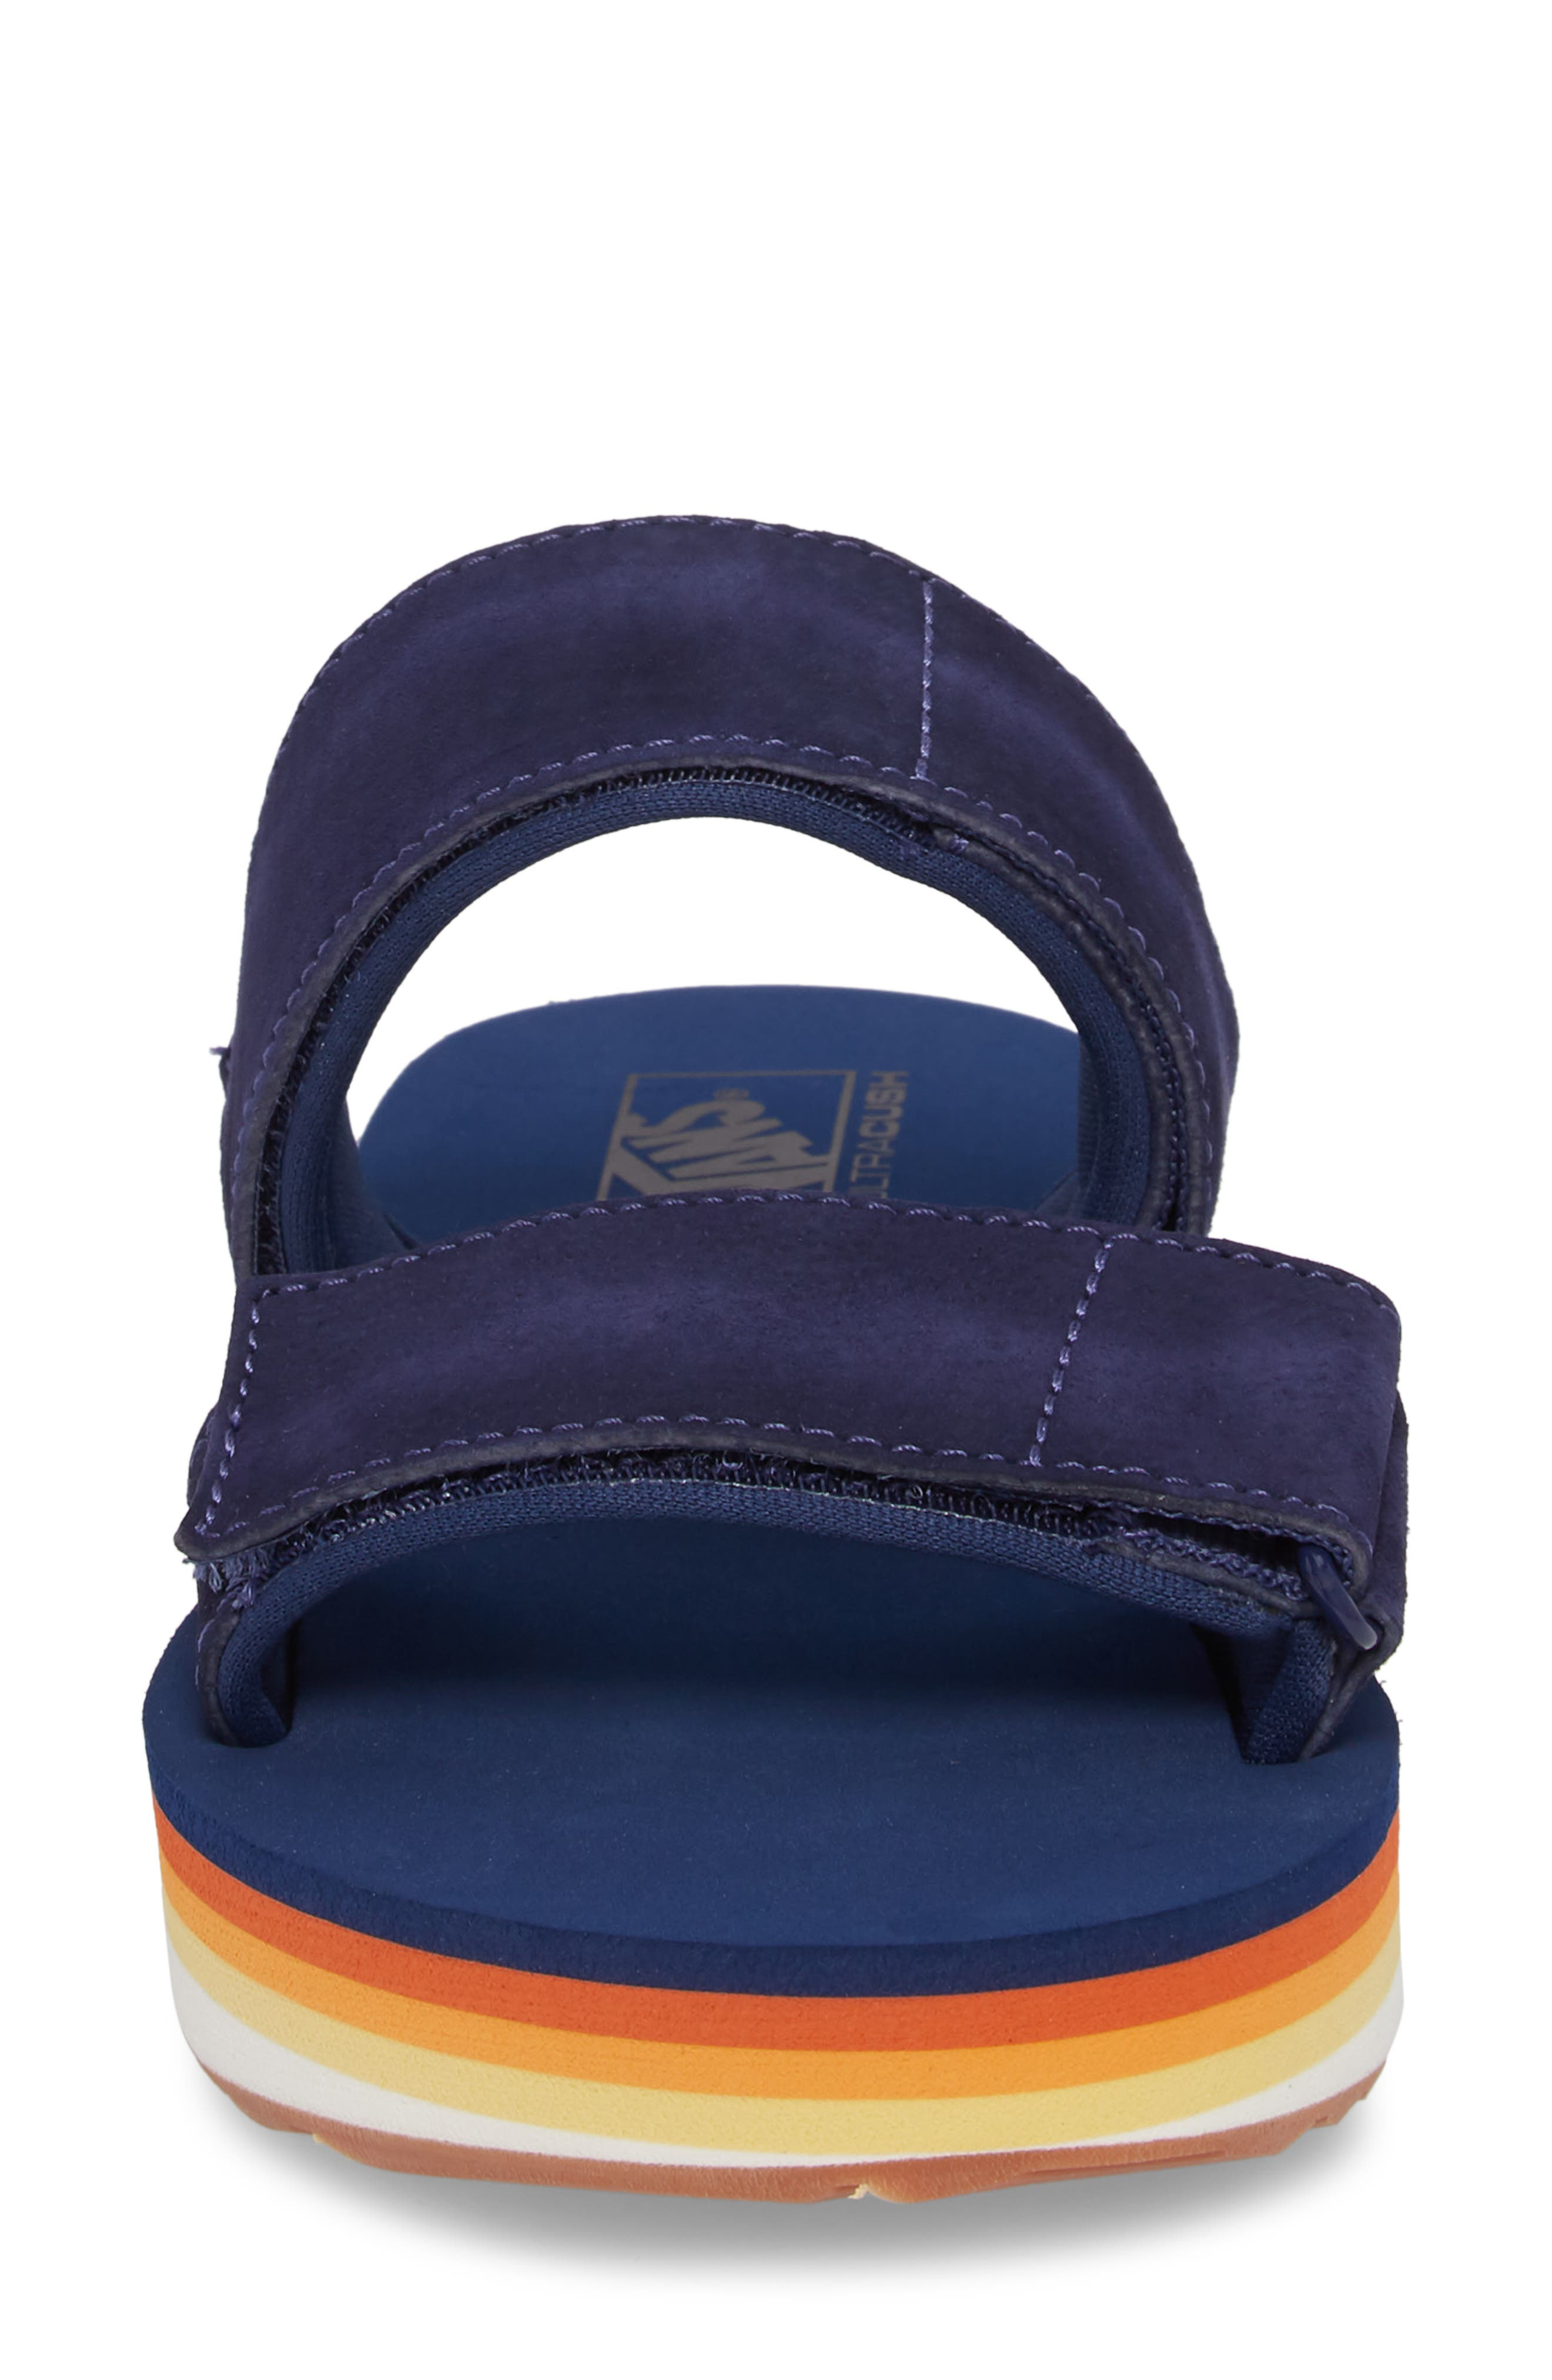 Cayucas Platform Slide Sandal,                             Alternate thumbnail 4, color,                             400